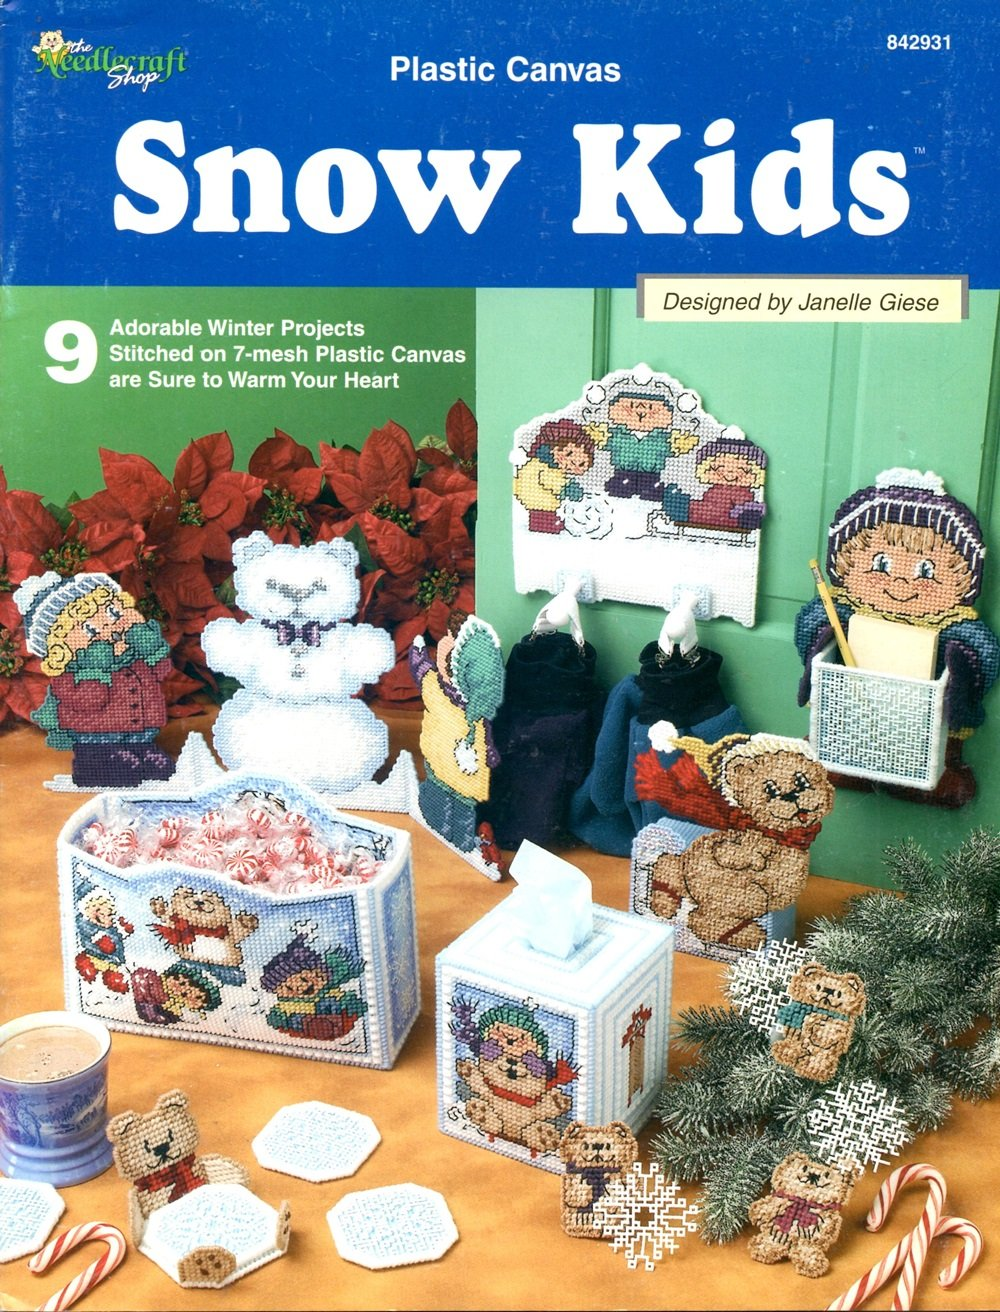 Plastic Canvas Snow Kids #842931 Paperback – 2001 Janelle Giese The Needlecraft Shop B001EYIXQY